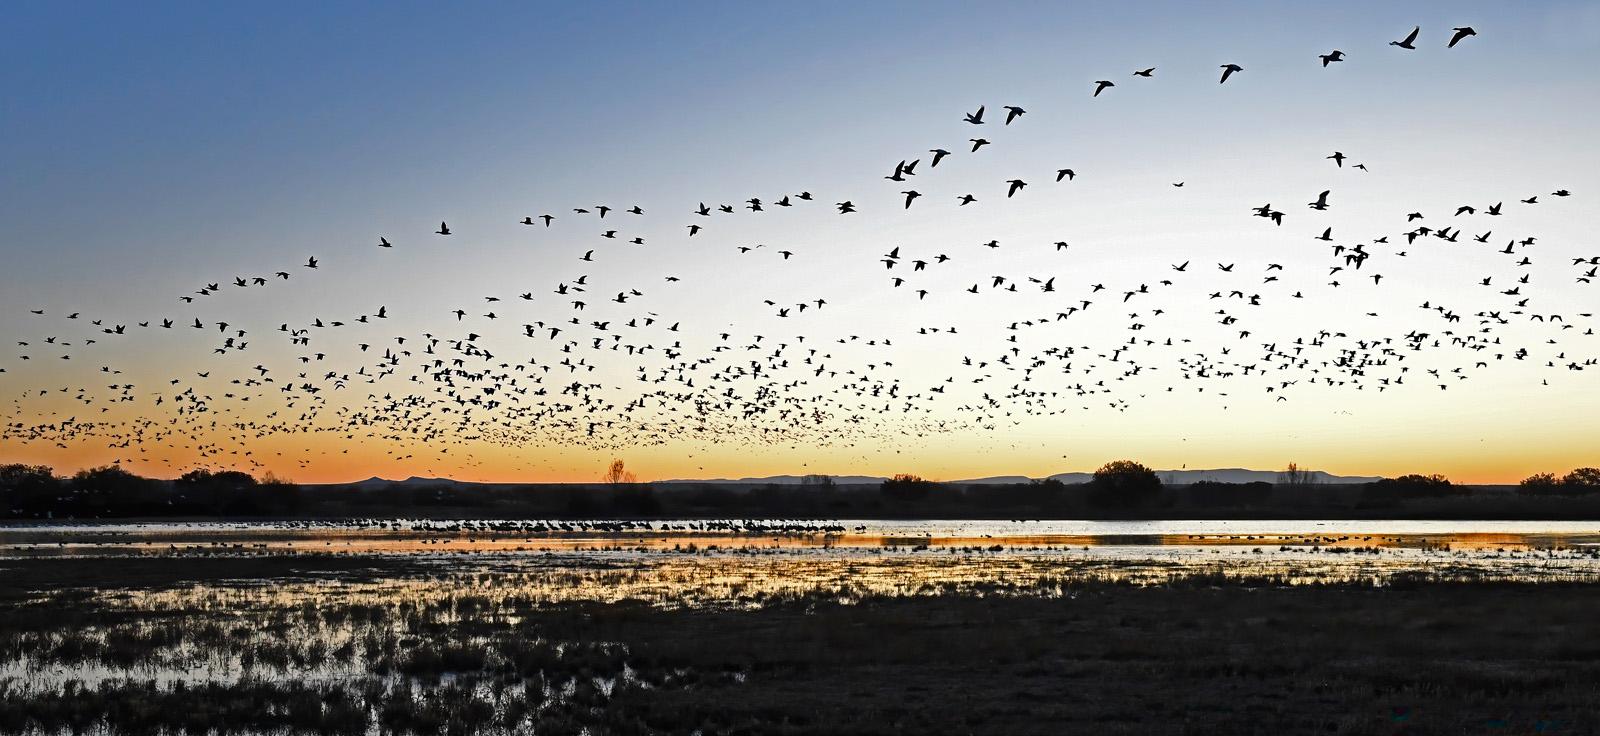 Name:  Snow-Geese-at-Sunrise-R---Bosque-del-Apache-111319-midi1600.jpg Views: 84 Size:  364.7 KB